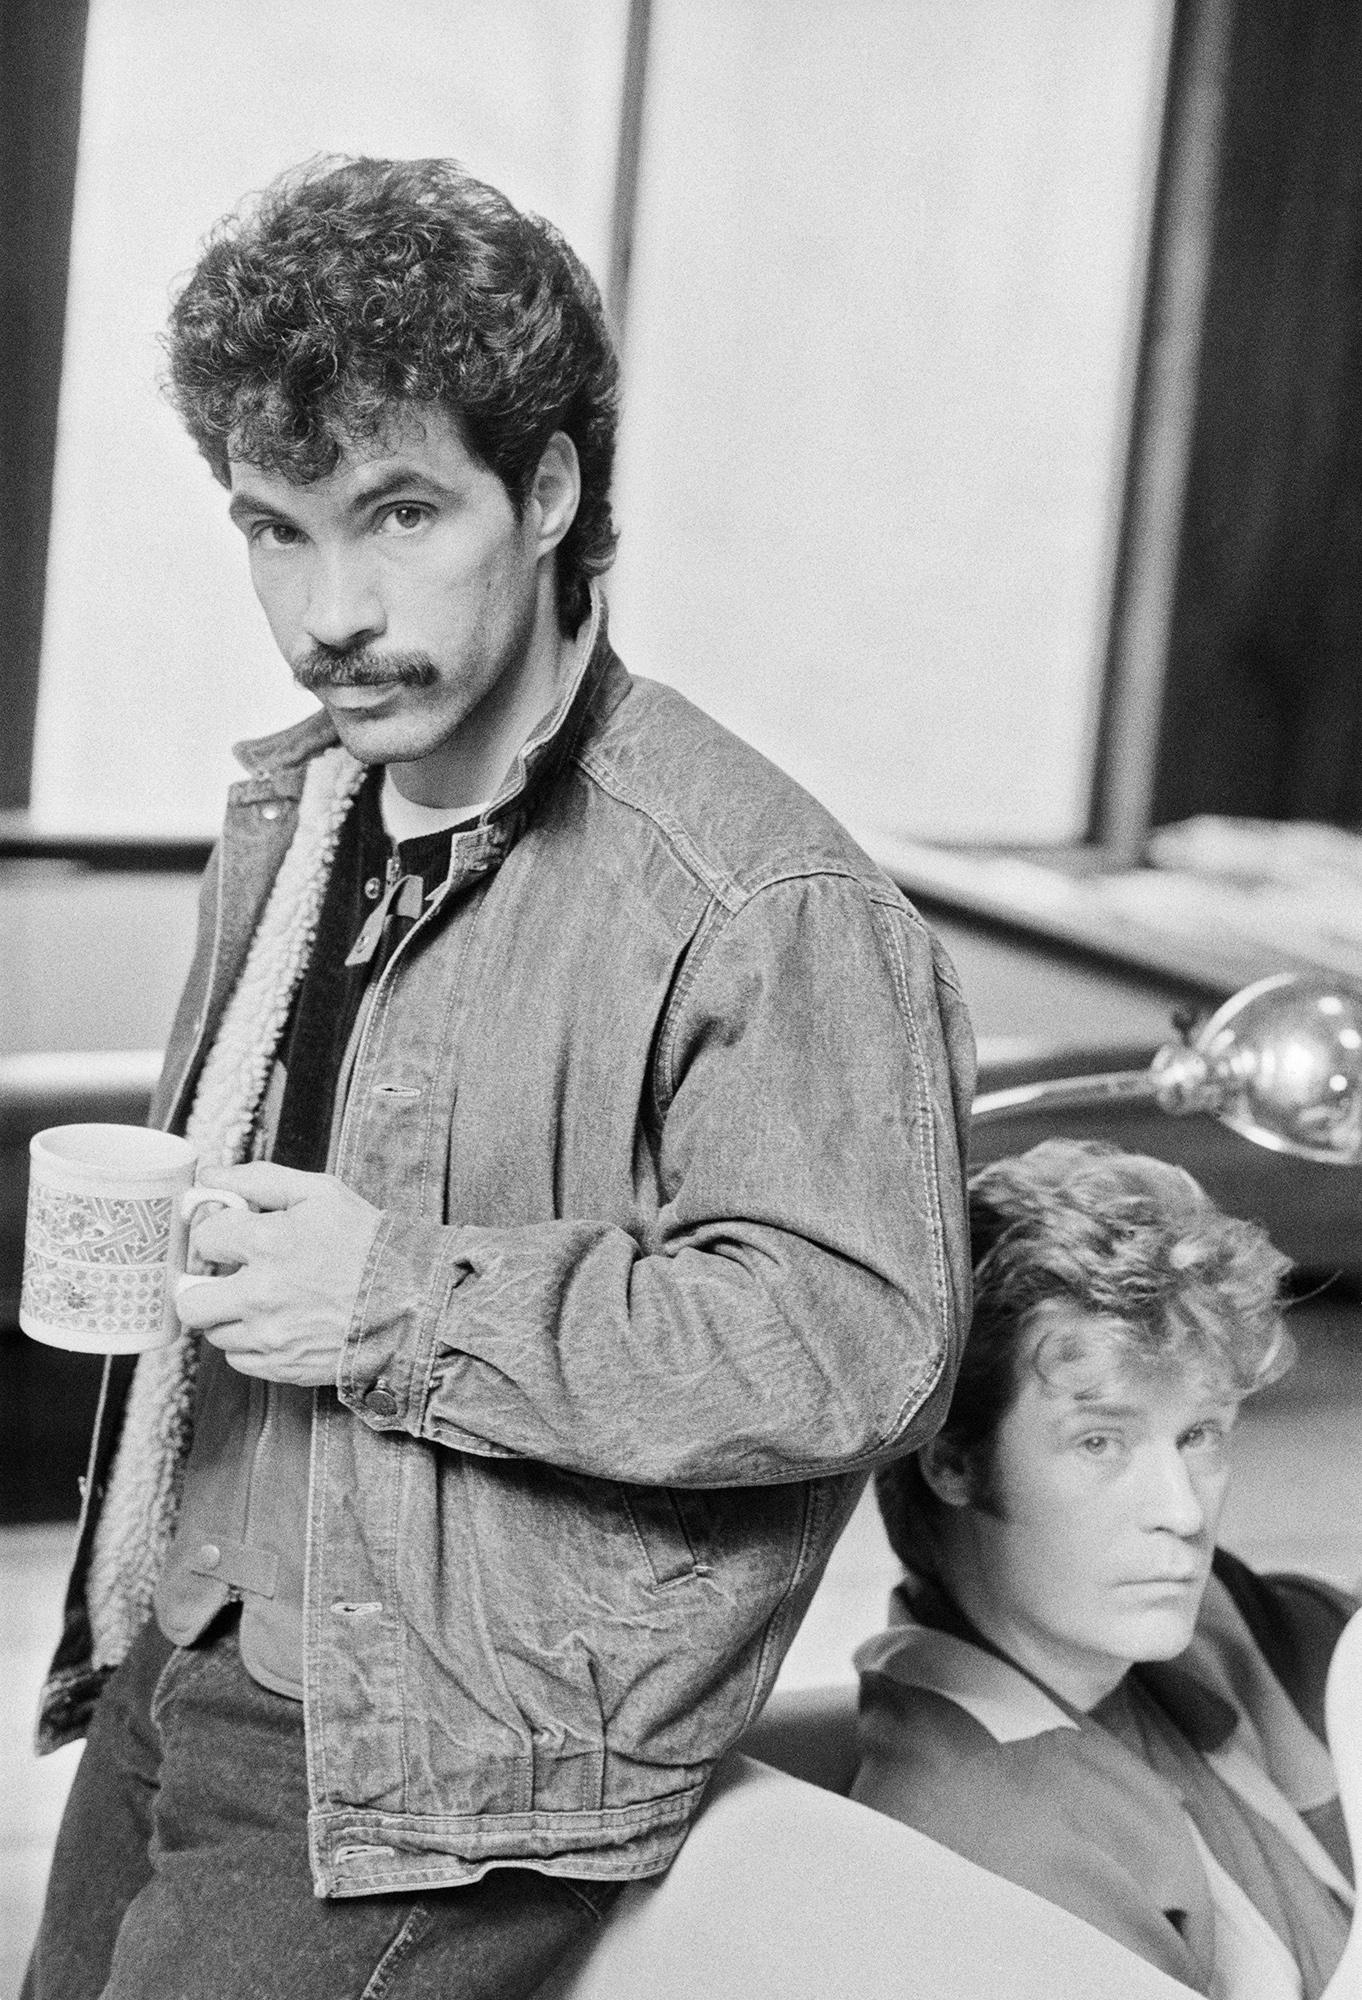 Джон Оутс (слева) иДэрил Холл, дуэт Hall & Oates, вфеврале 1983 года